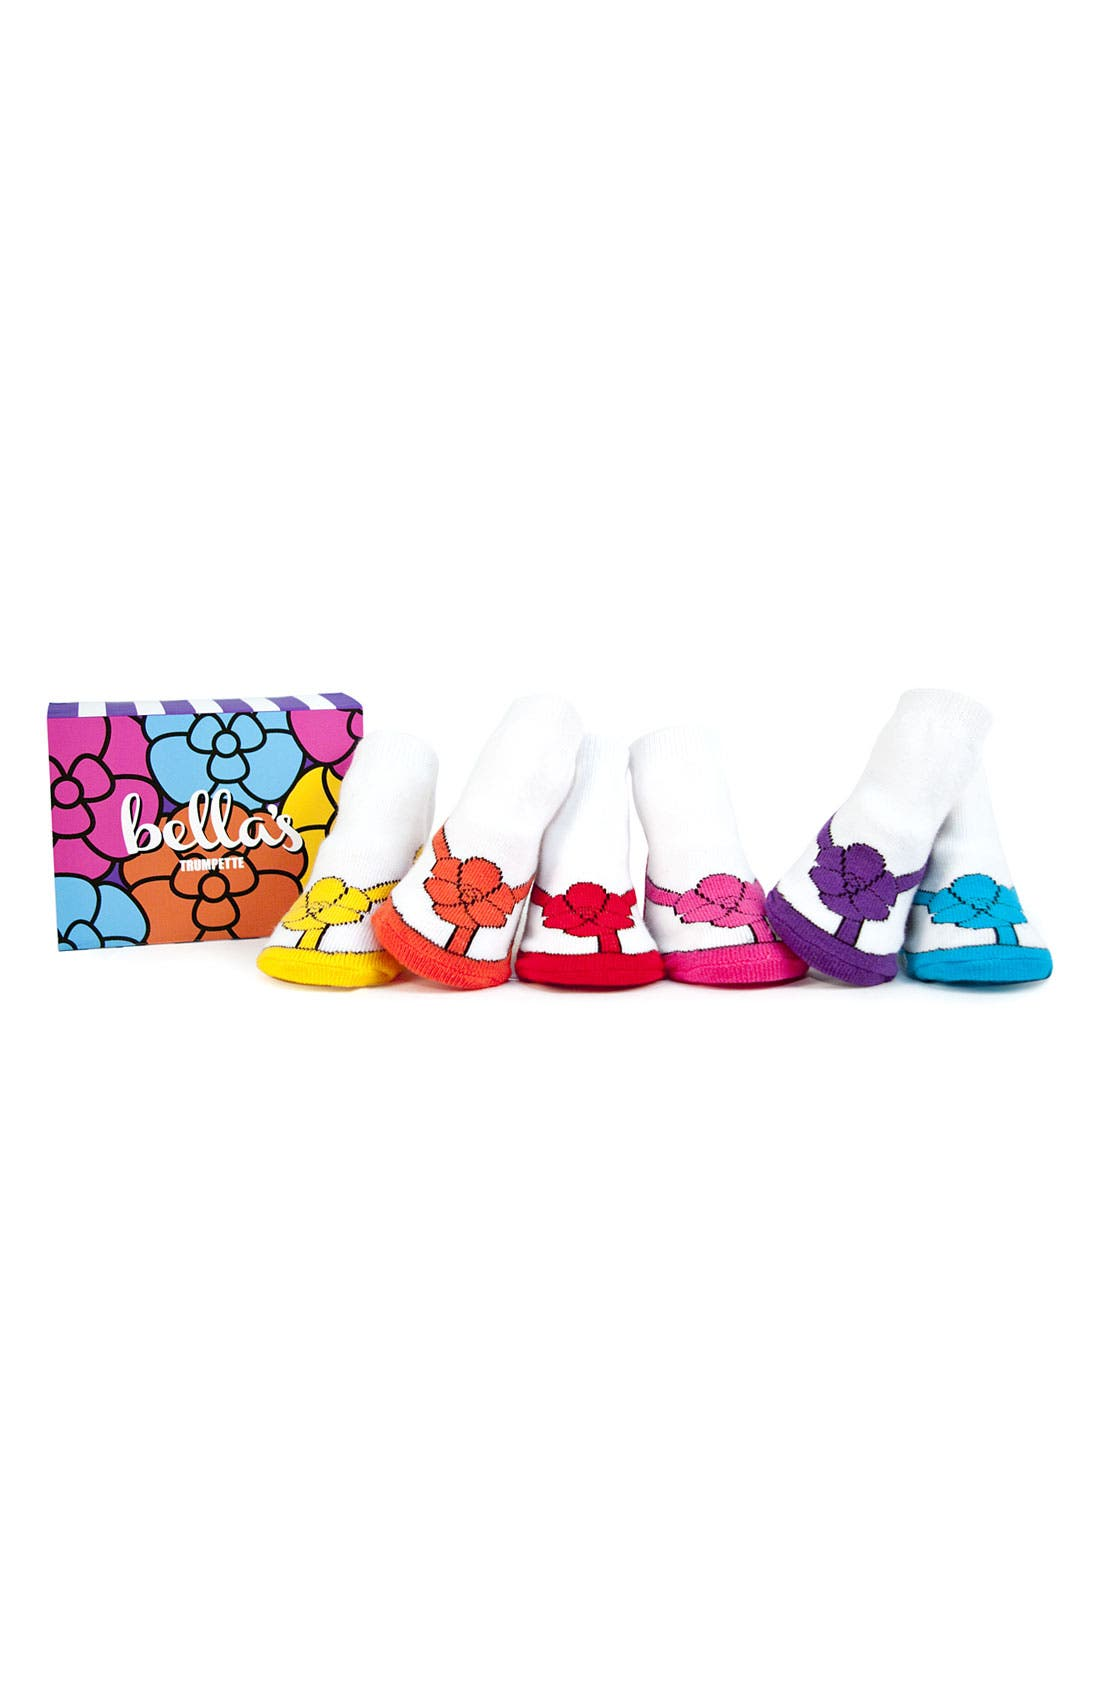 Alternate Image 1 Selected - Trumpette 'Bella's' Socks Gift Set (Baby Girls)